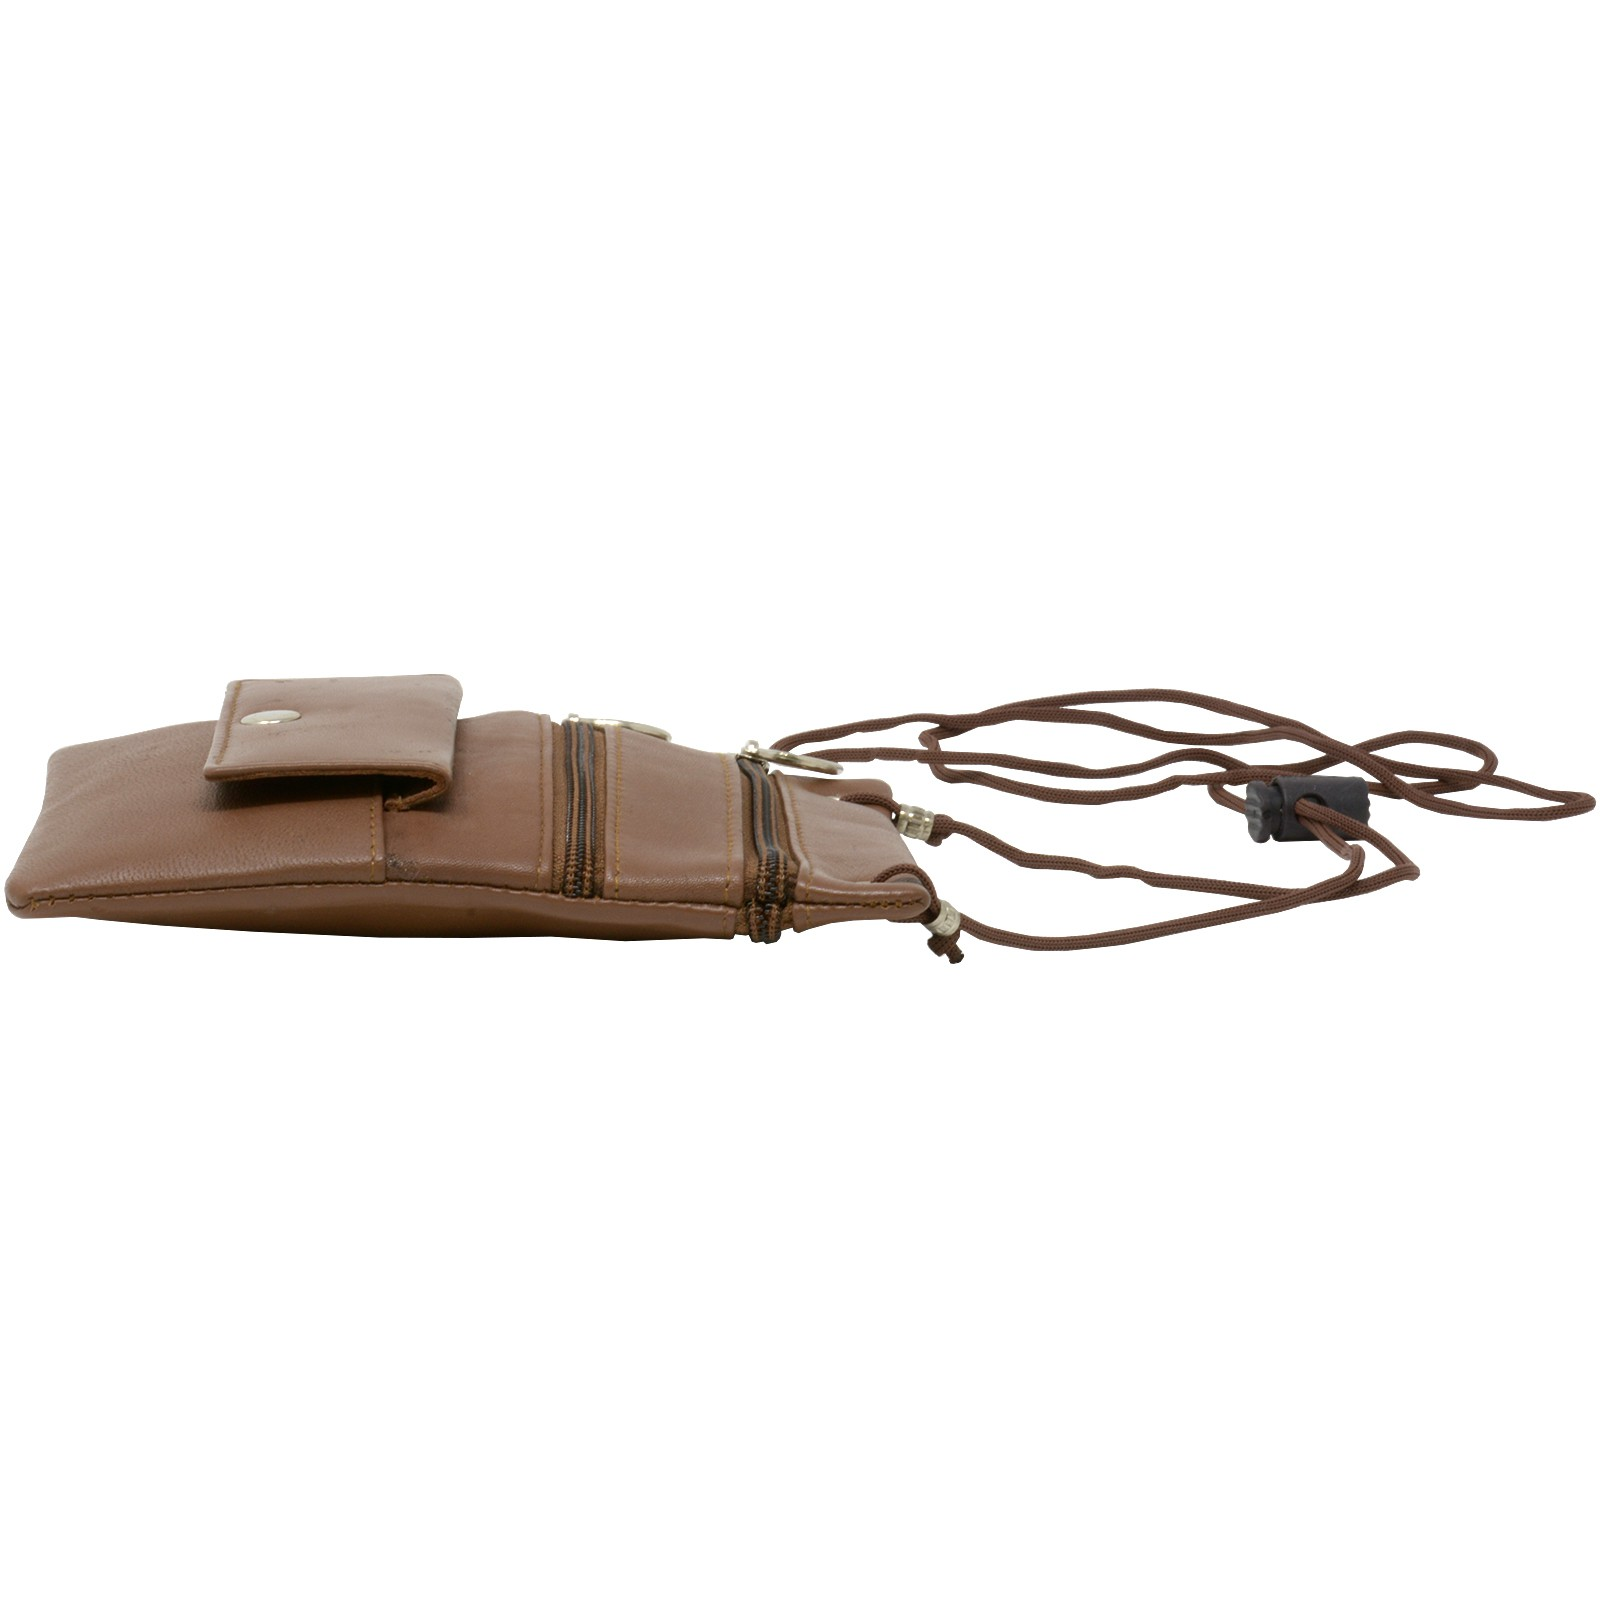 Soft-Leather-Purse-Organizer-Shoulder-Bag-4-Pocket-Micro-Handbag-Travel-Wallet thumbnail 21